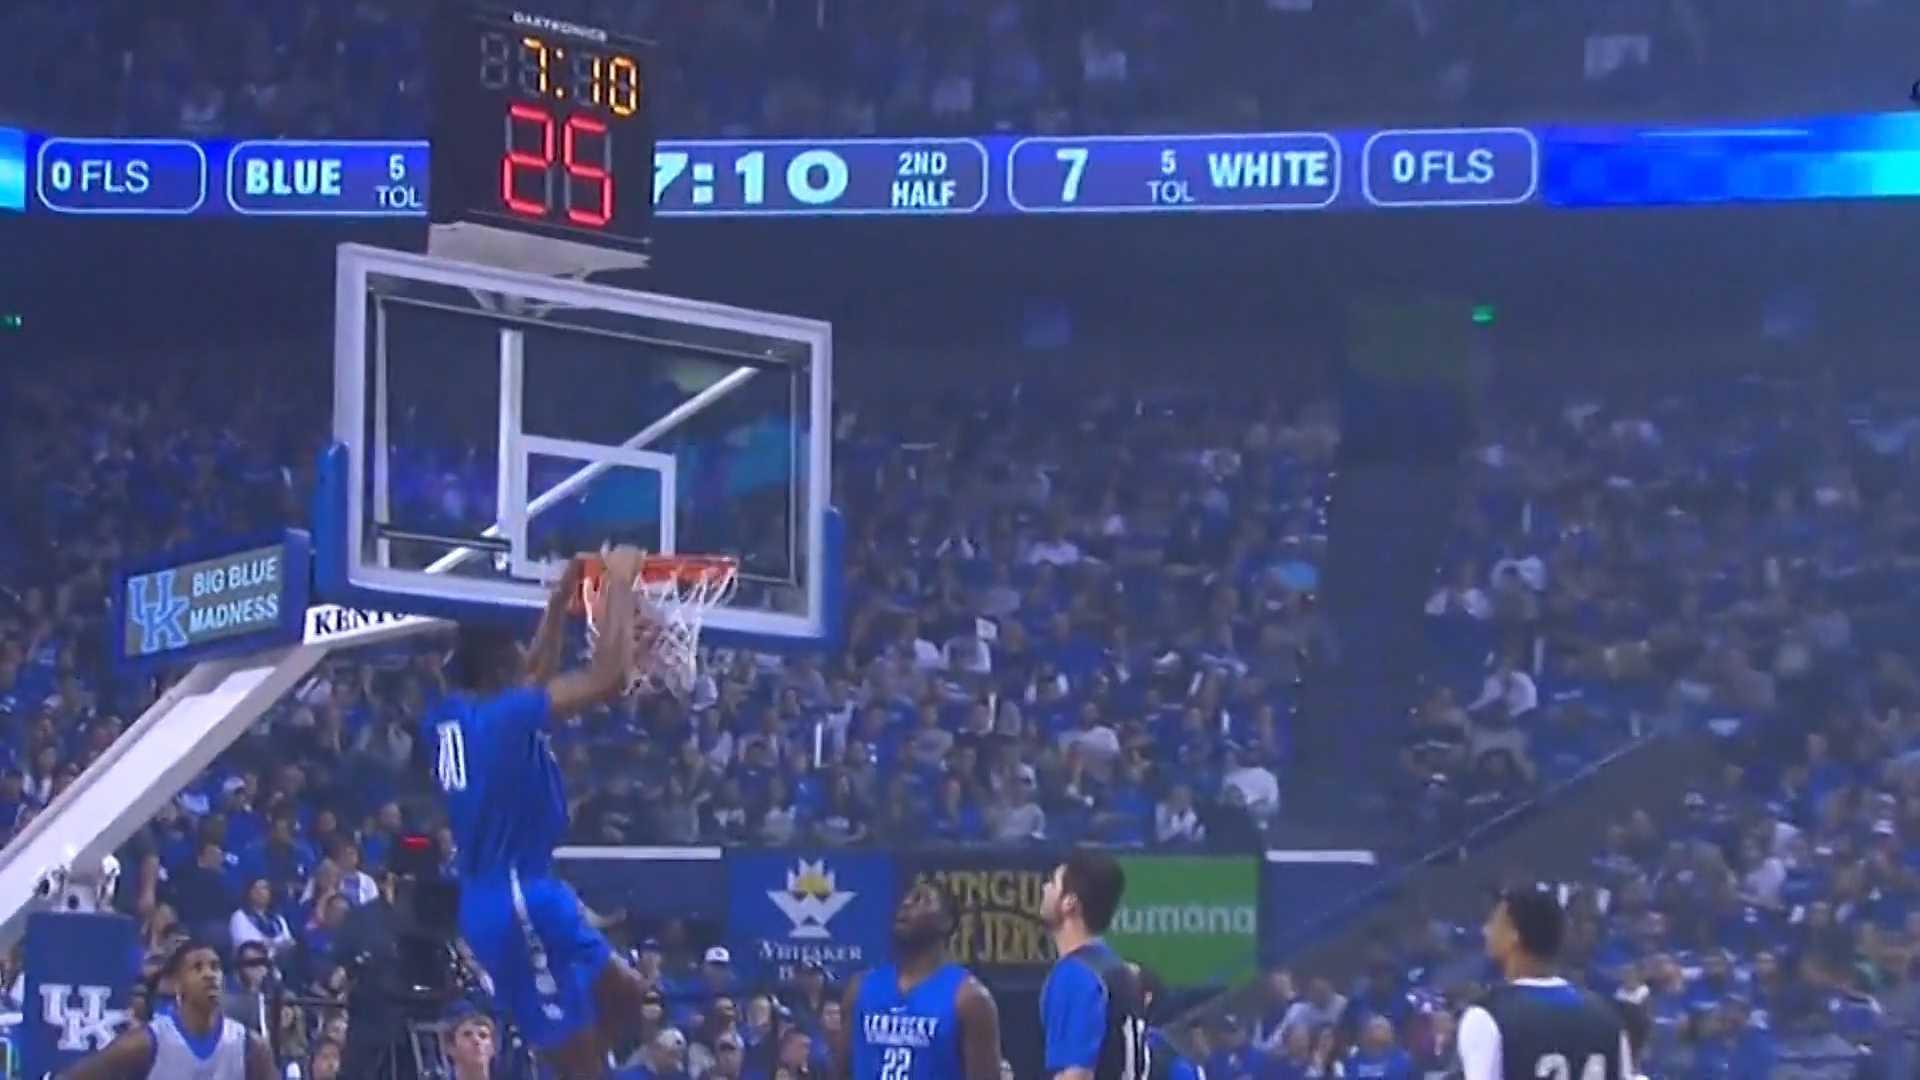 Big Blue Madness officially starts UK basketball season - Louisville news - NewsLocker